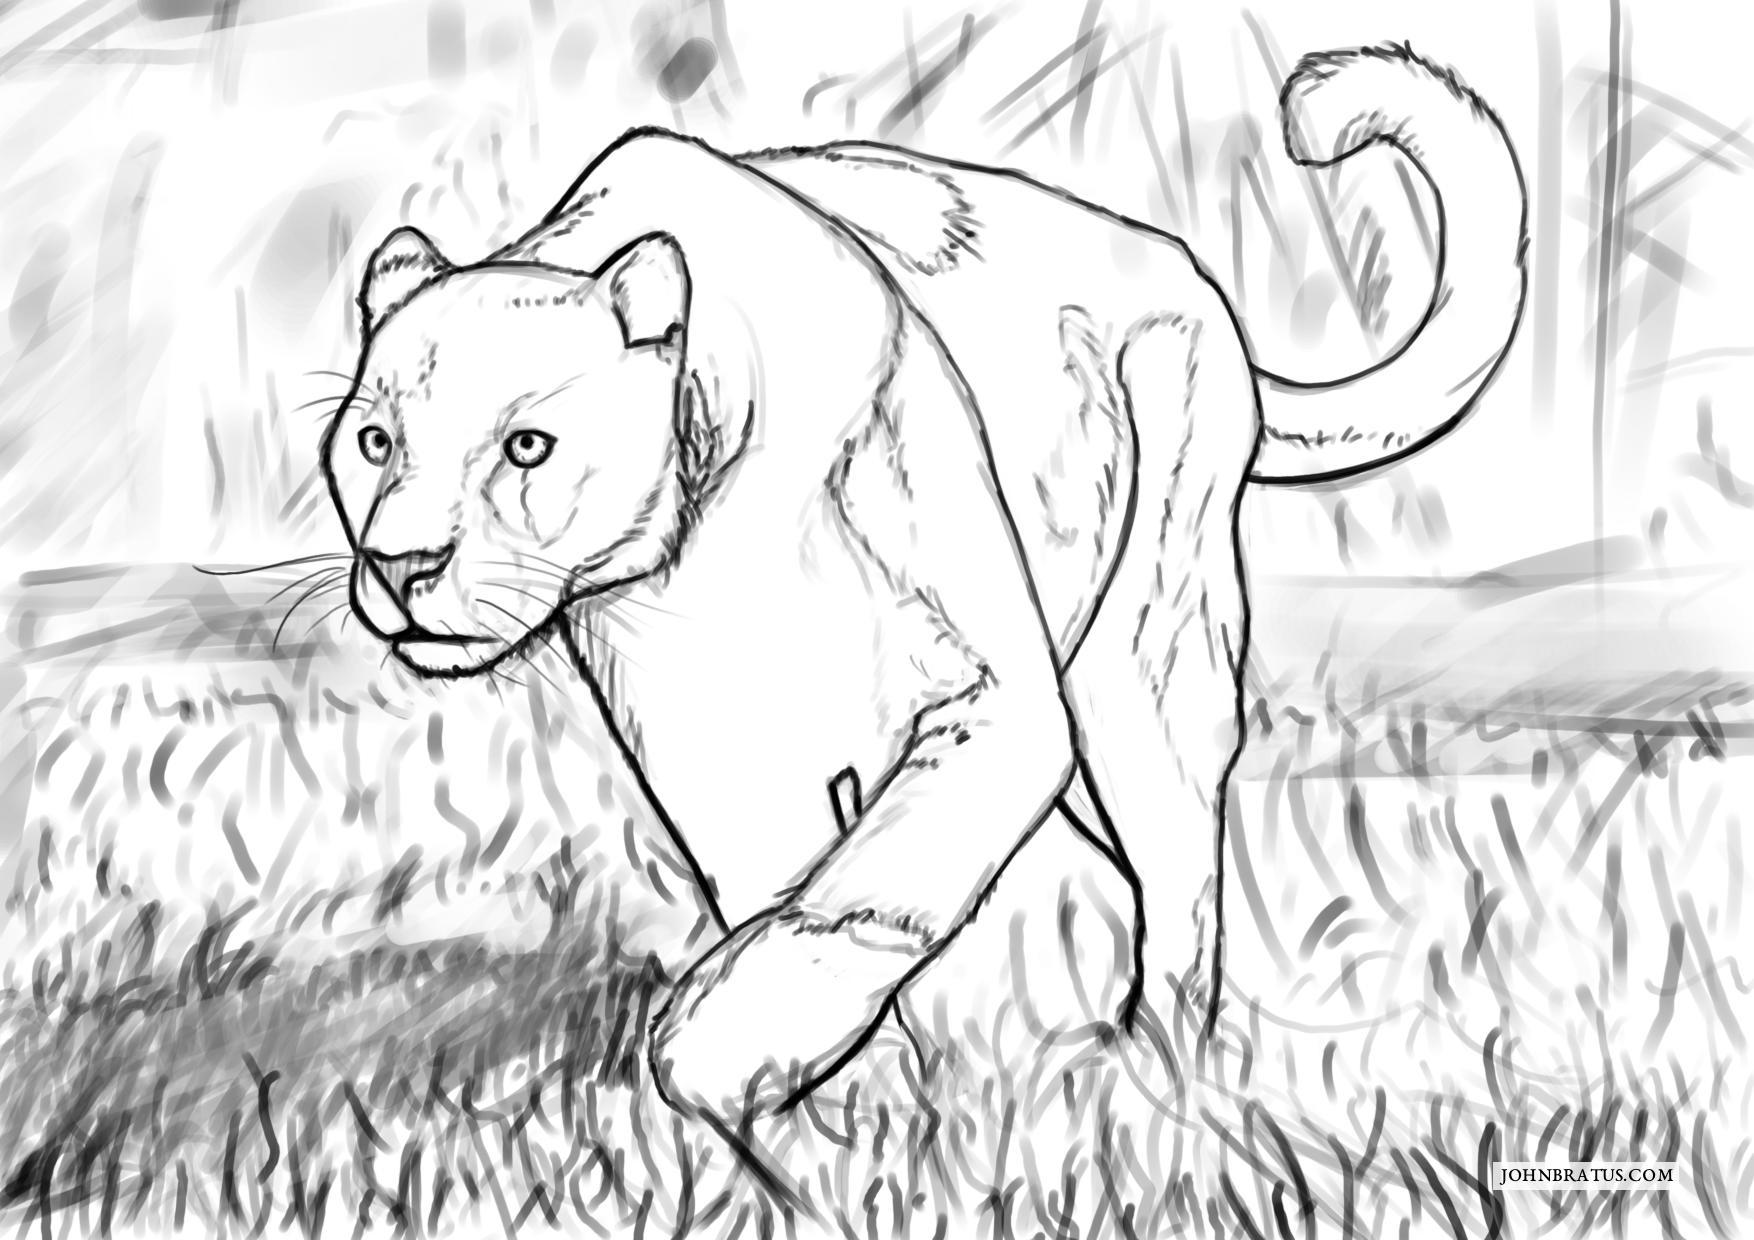 Digital sketch of a wandering black panther